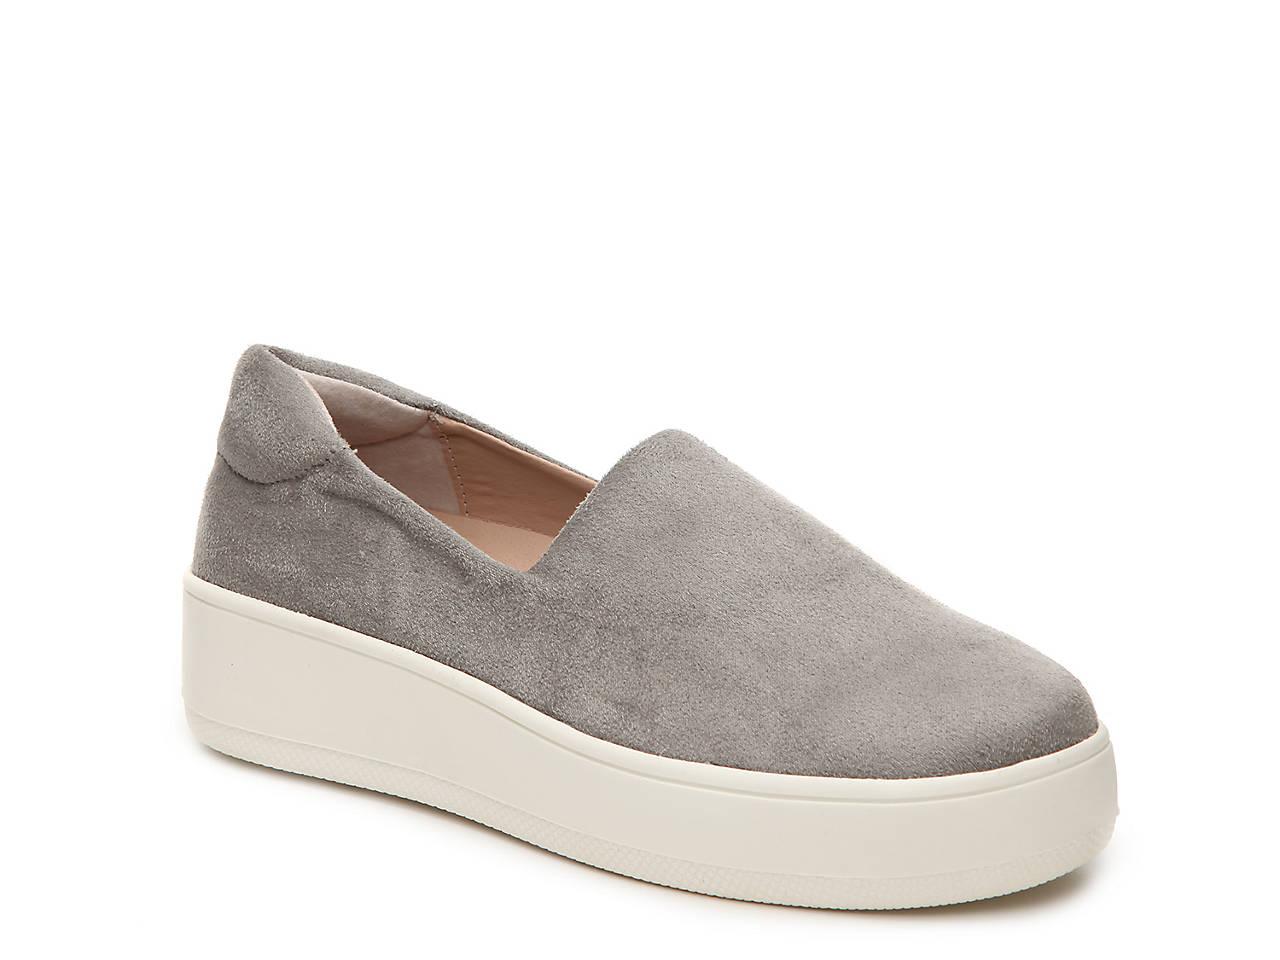 Hilda Flatform Slip-On Sneaker